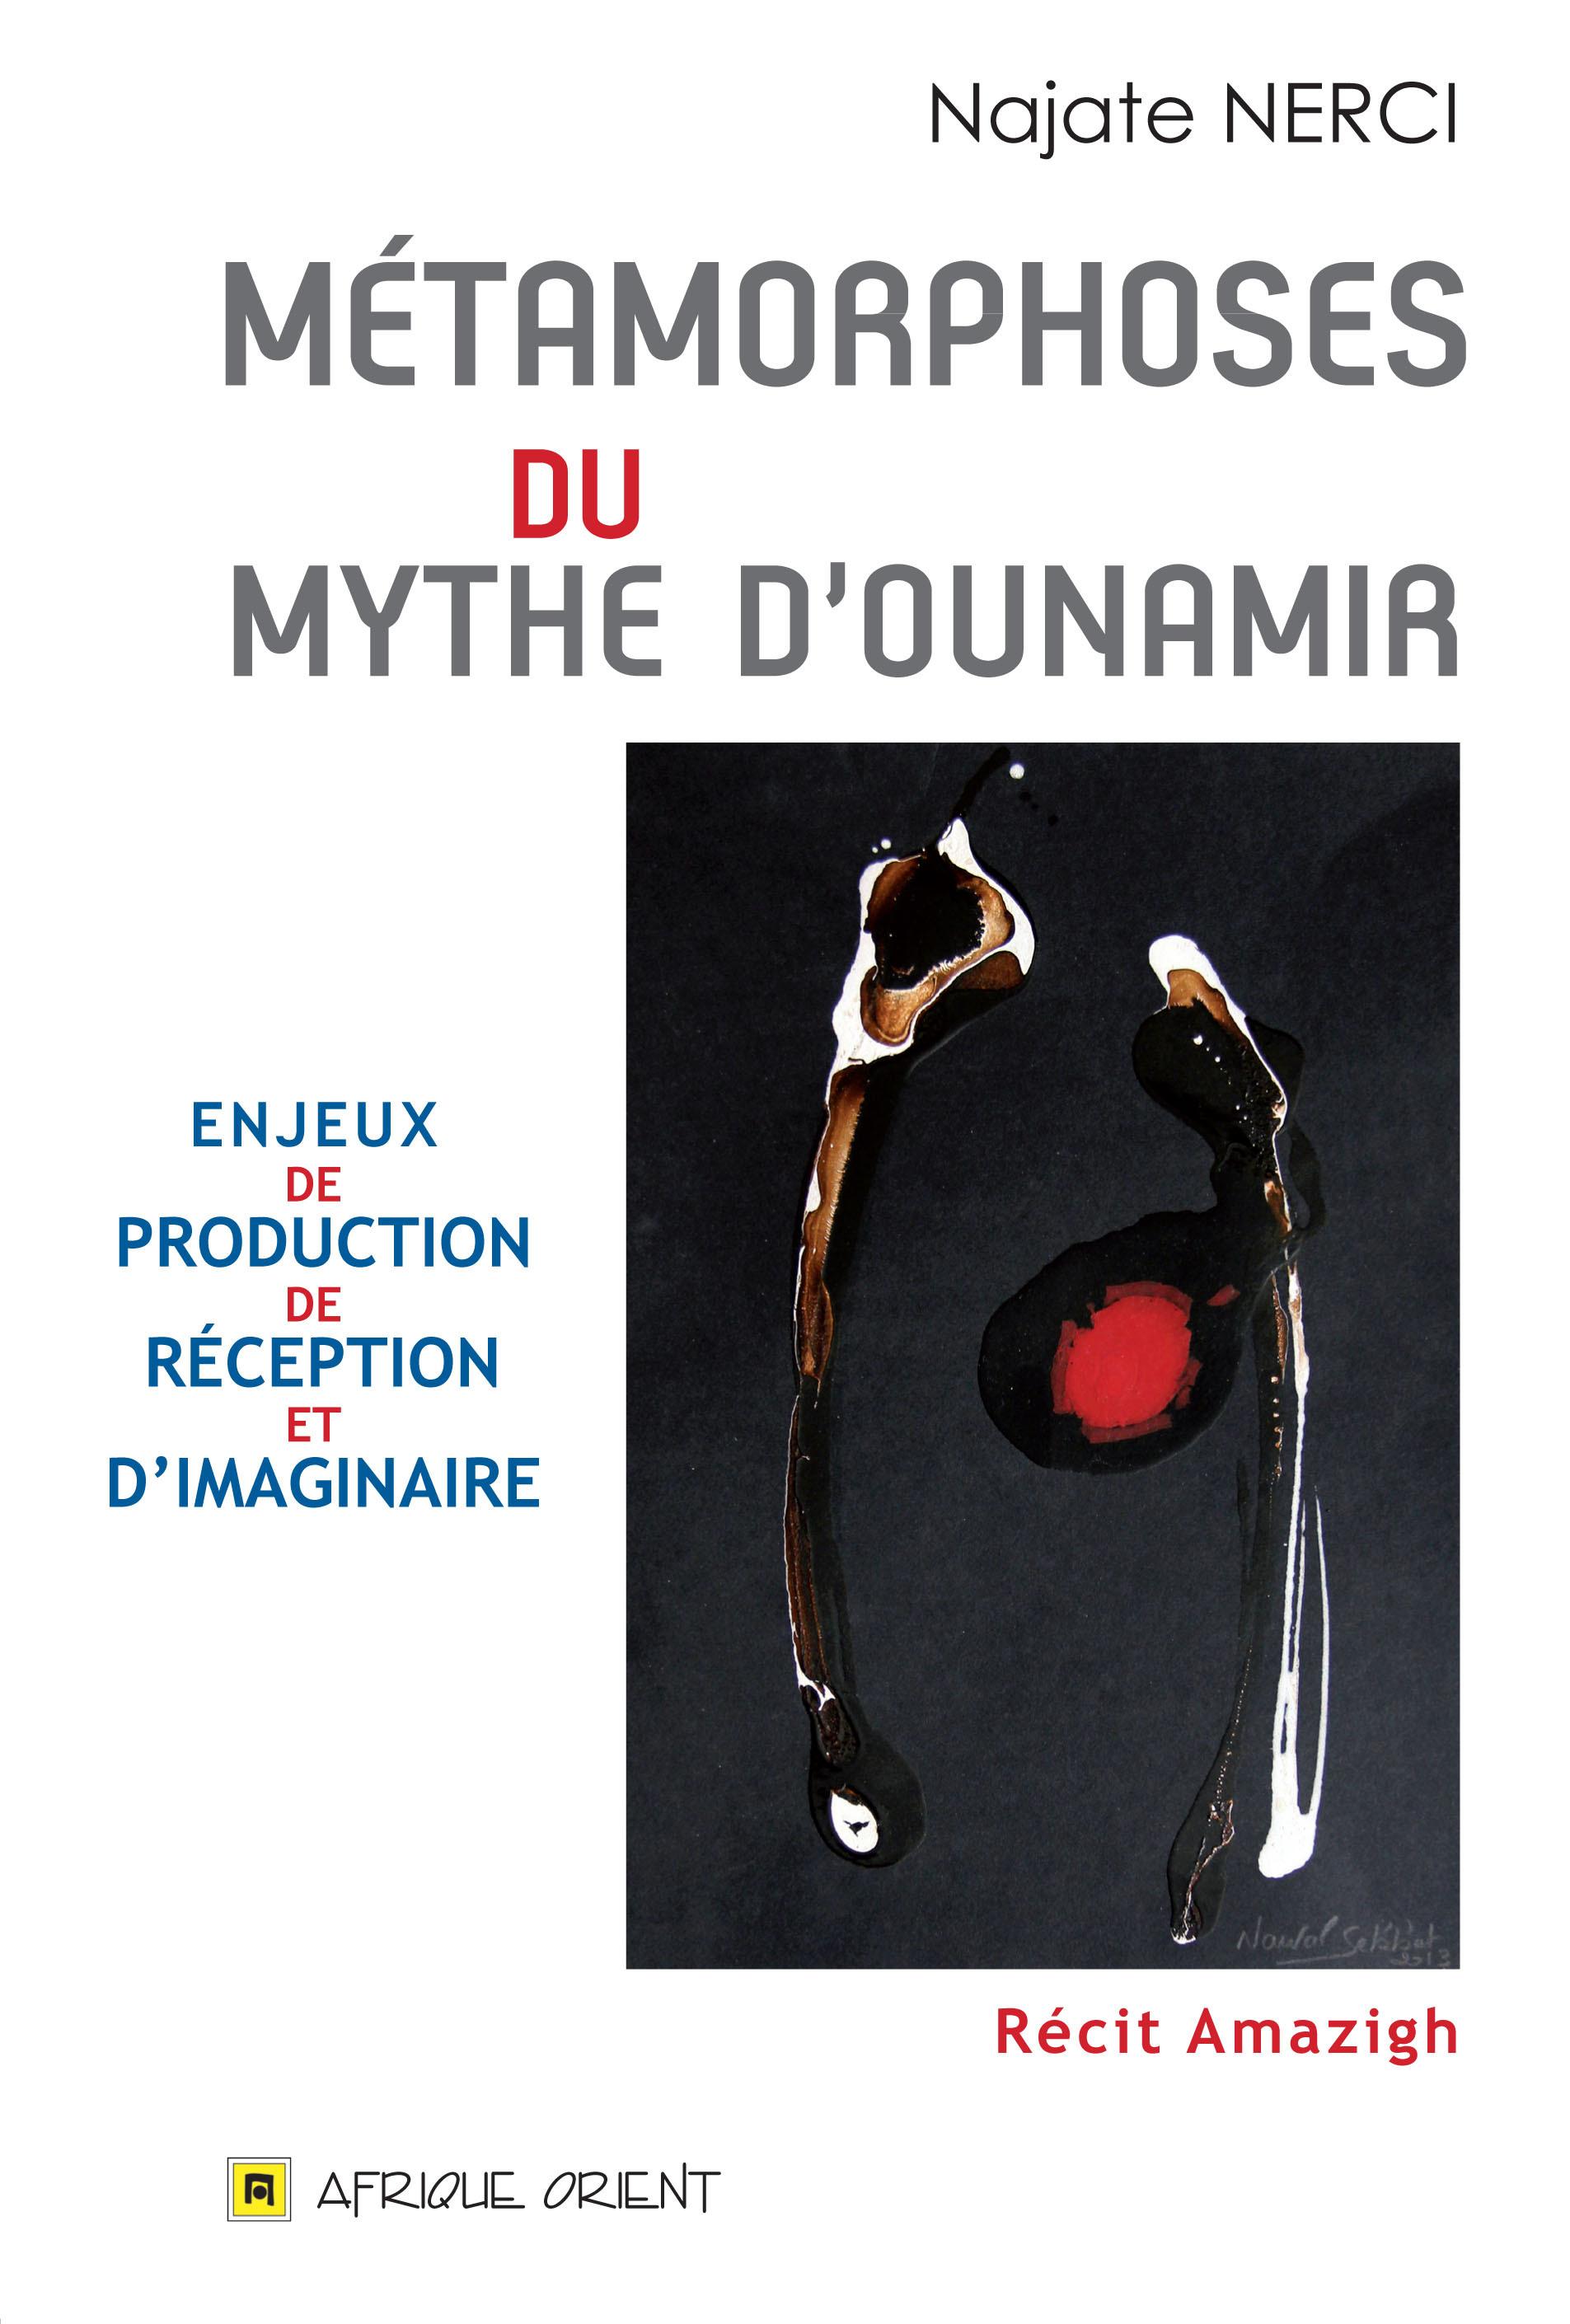 METAMORPHOSES DU MYTHE D'OUNAMIR